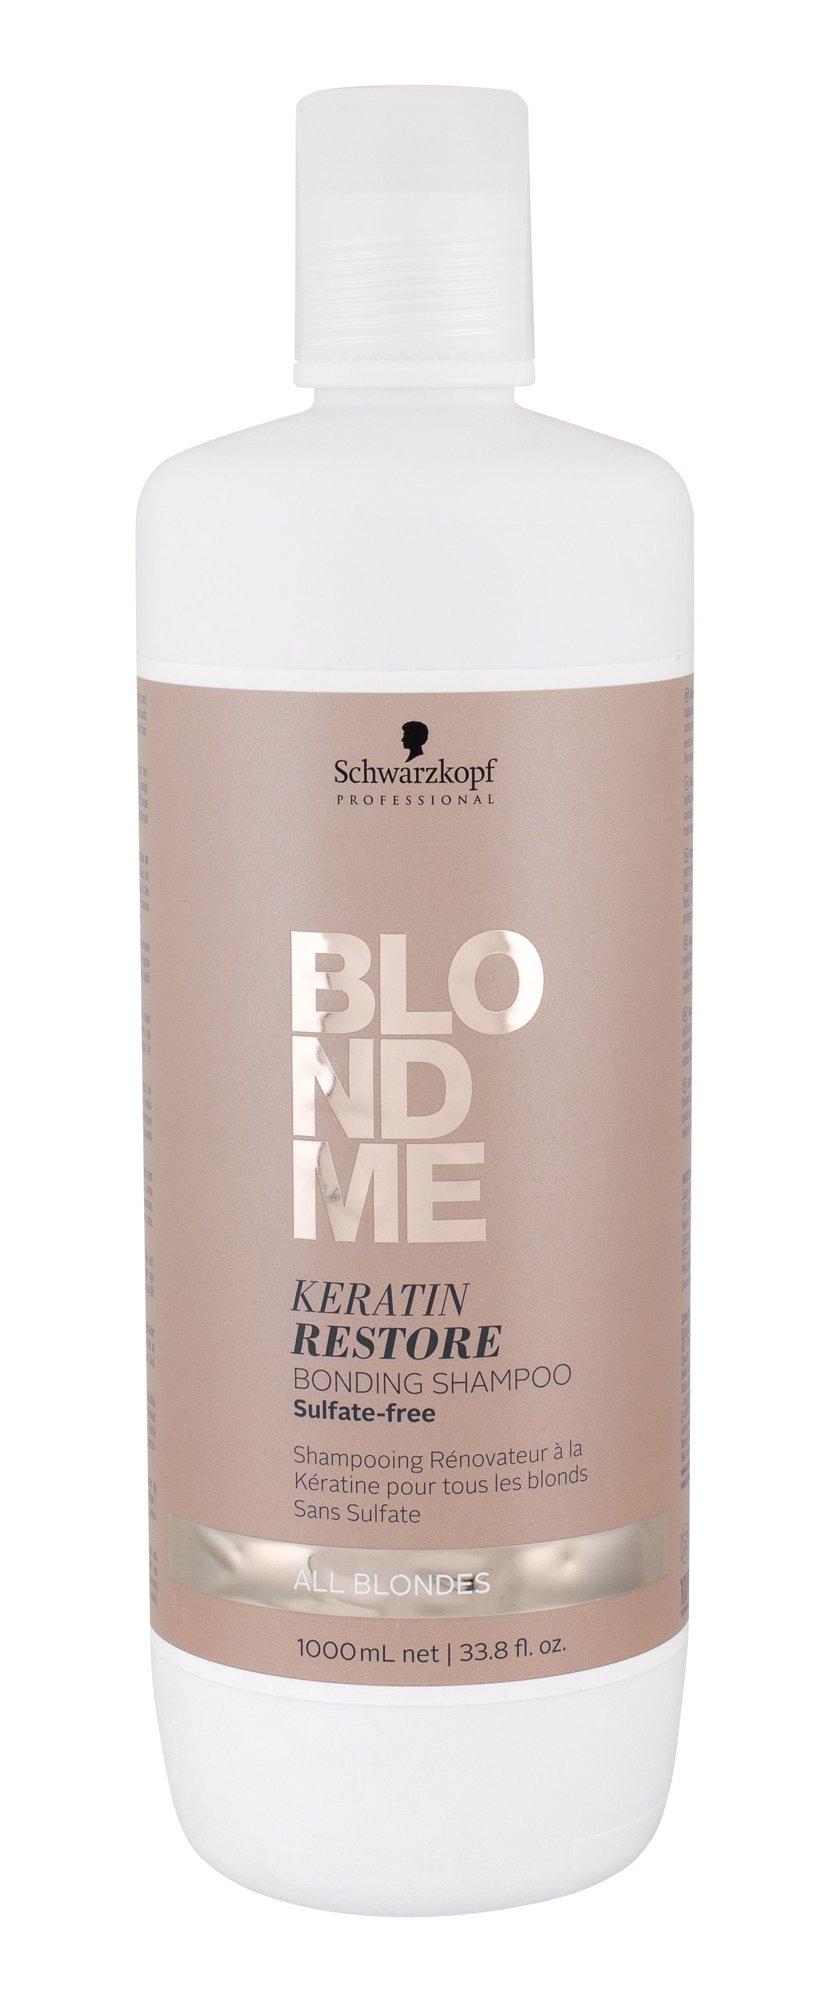 Schwarzkopf Blond Me Shampoo 1000ml